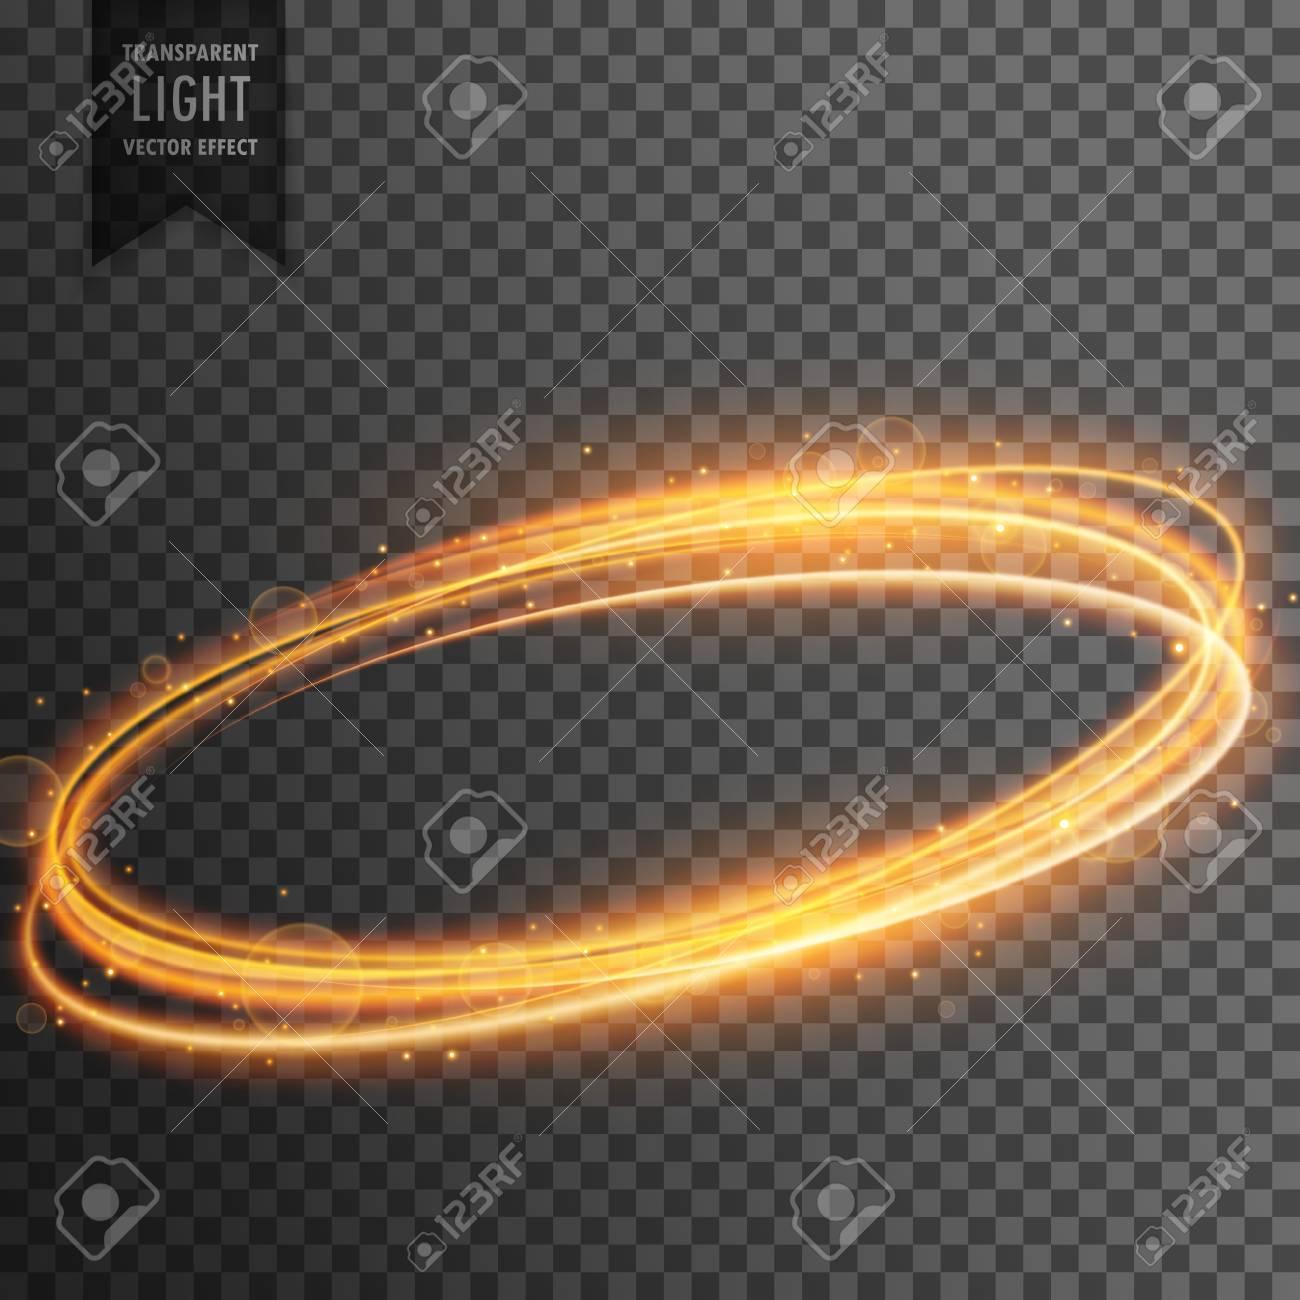 neon transparent golden light effect background - 83430610